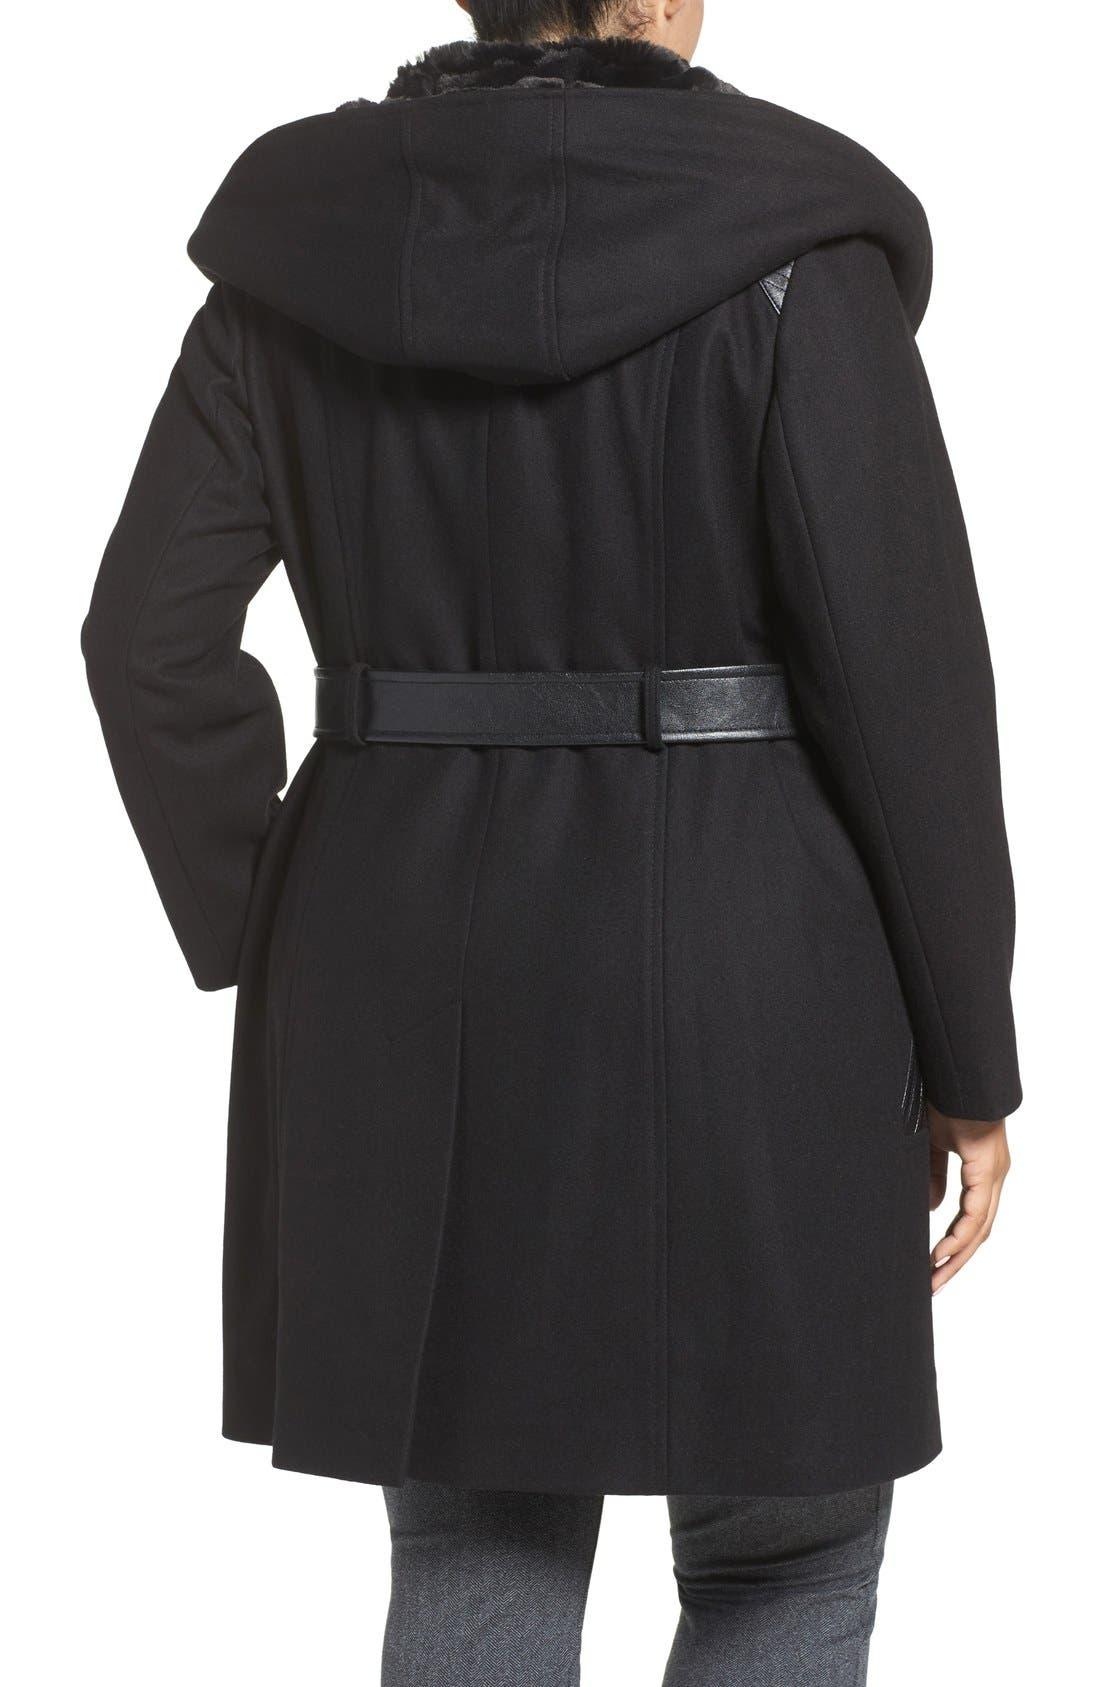 Wool Blend Coat with Faux Fur Trim,                             Alternate thumbnail 2, color,                             001